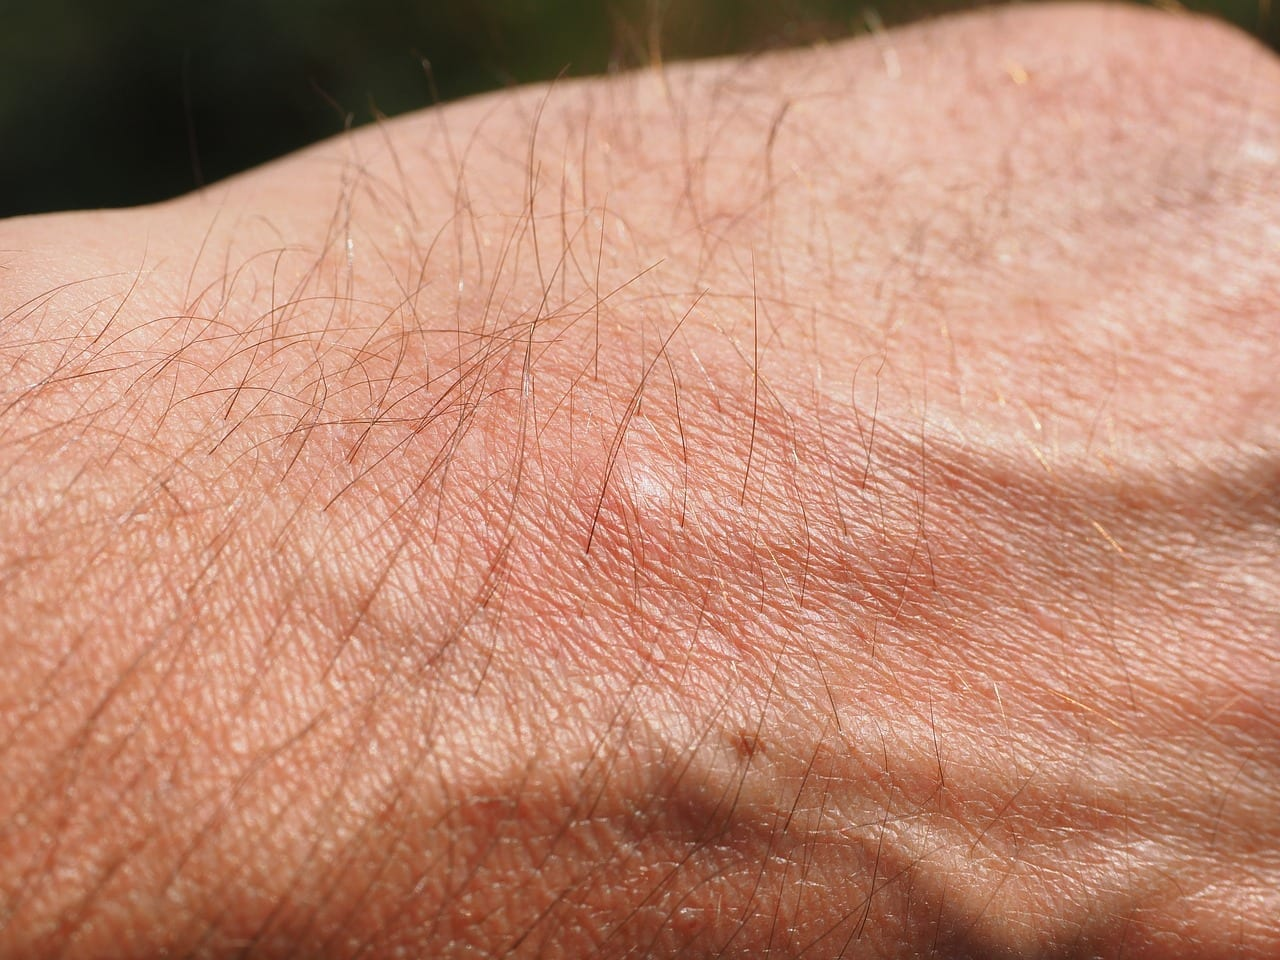 getting rid of mosquito bites